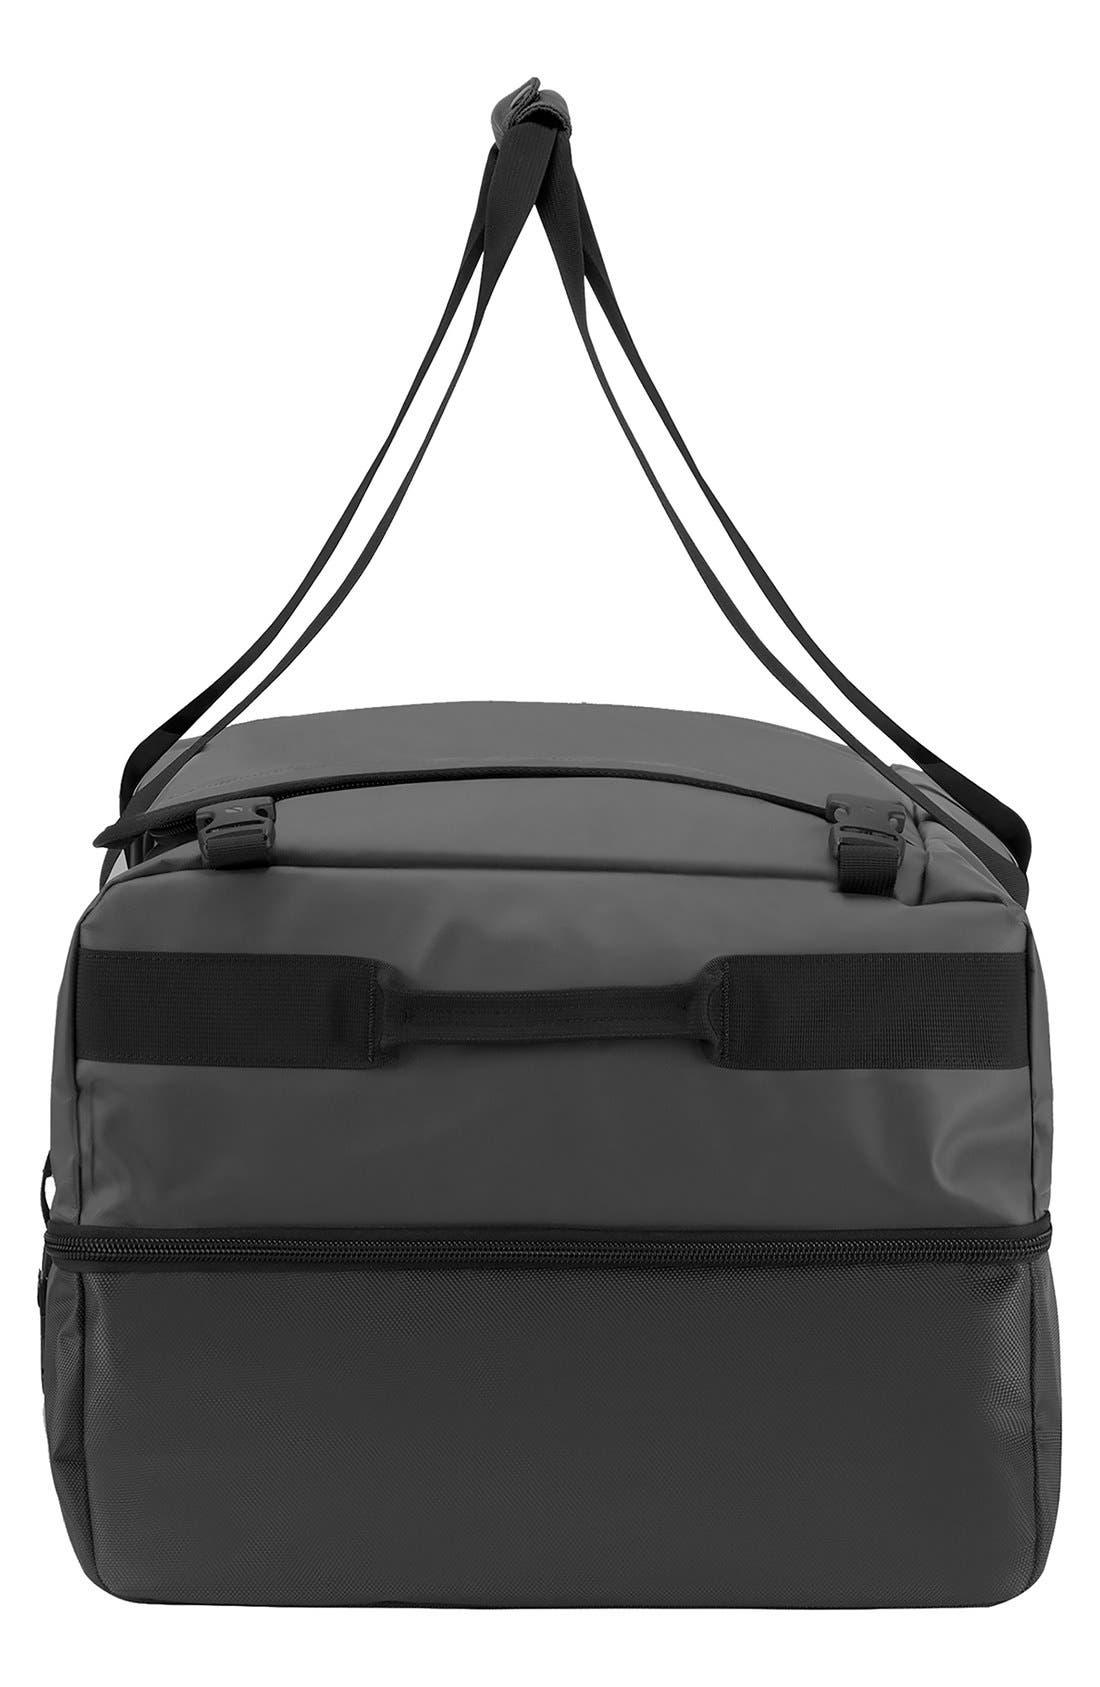 TRACTO Medium Split Convertible Duffel Bag,                             Alternate thumbnail 3, color,                             001